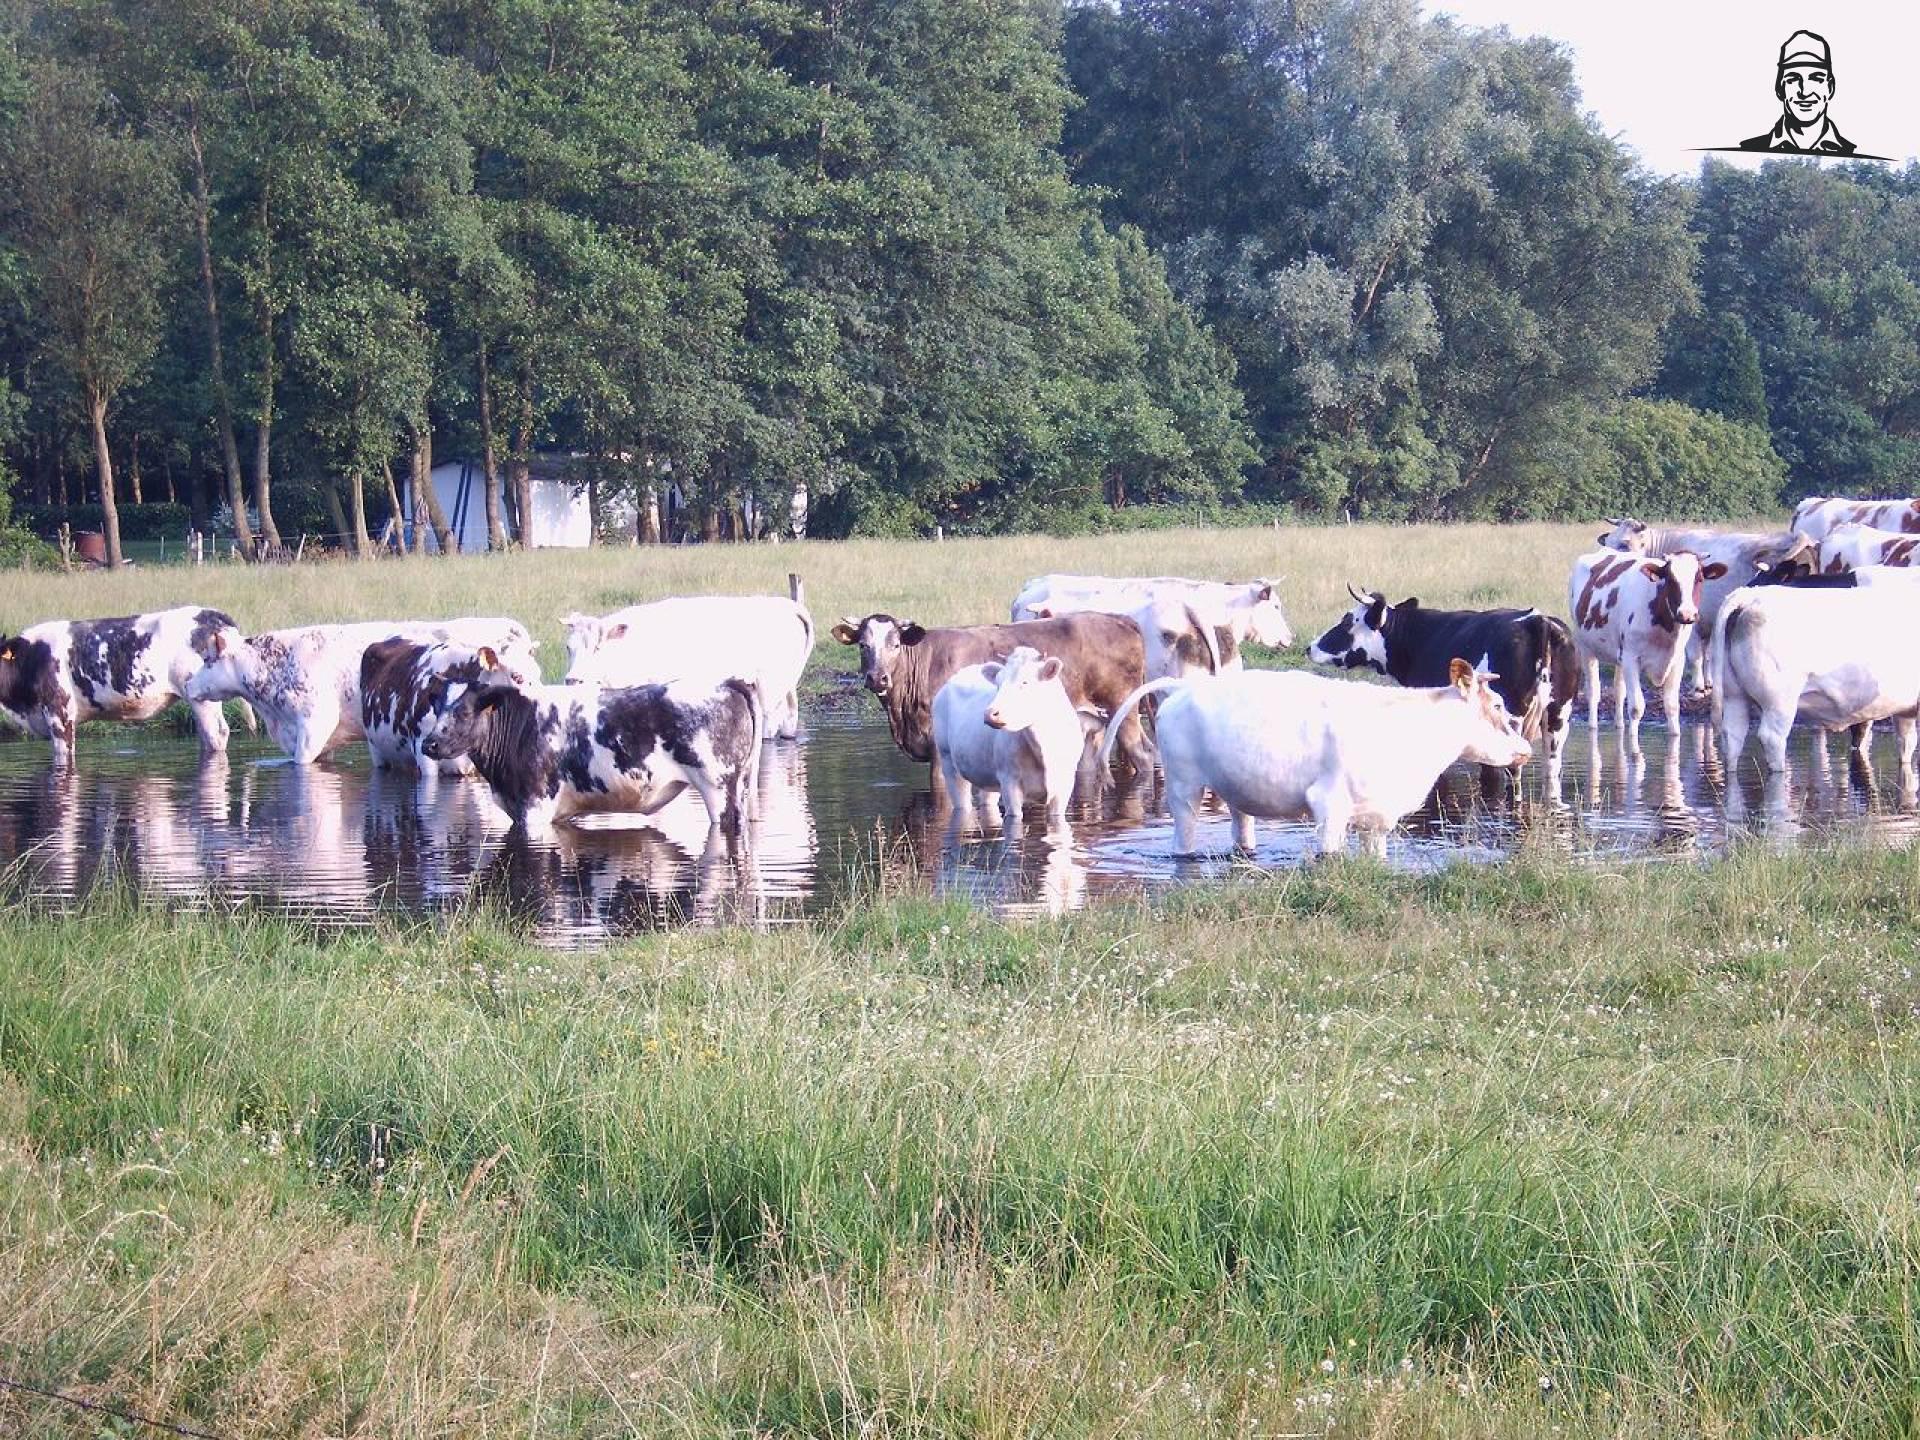 Koeien van stevenbrocatusnhjd